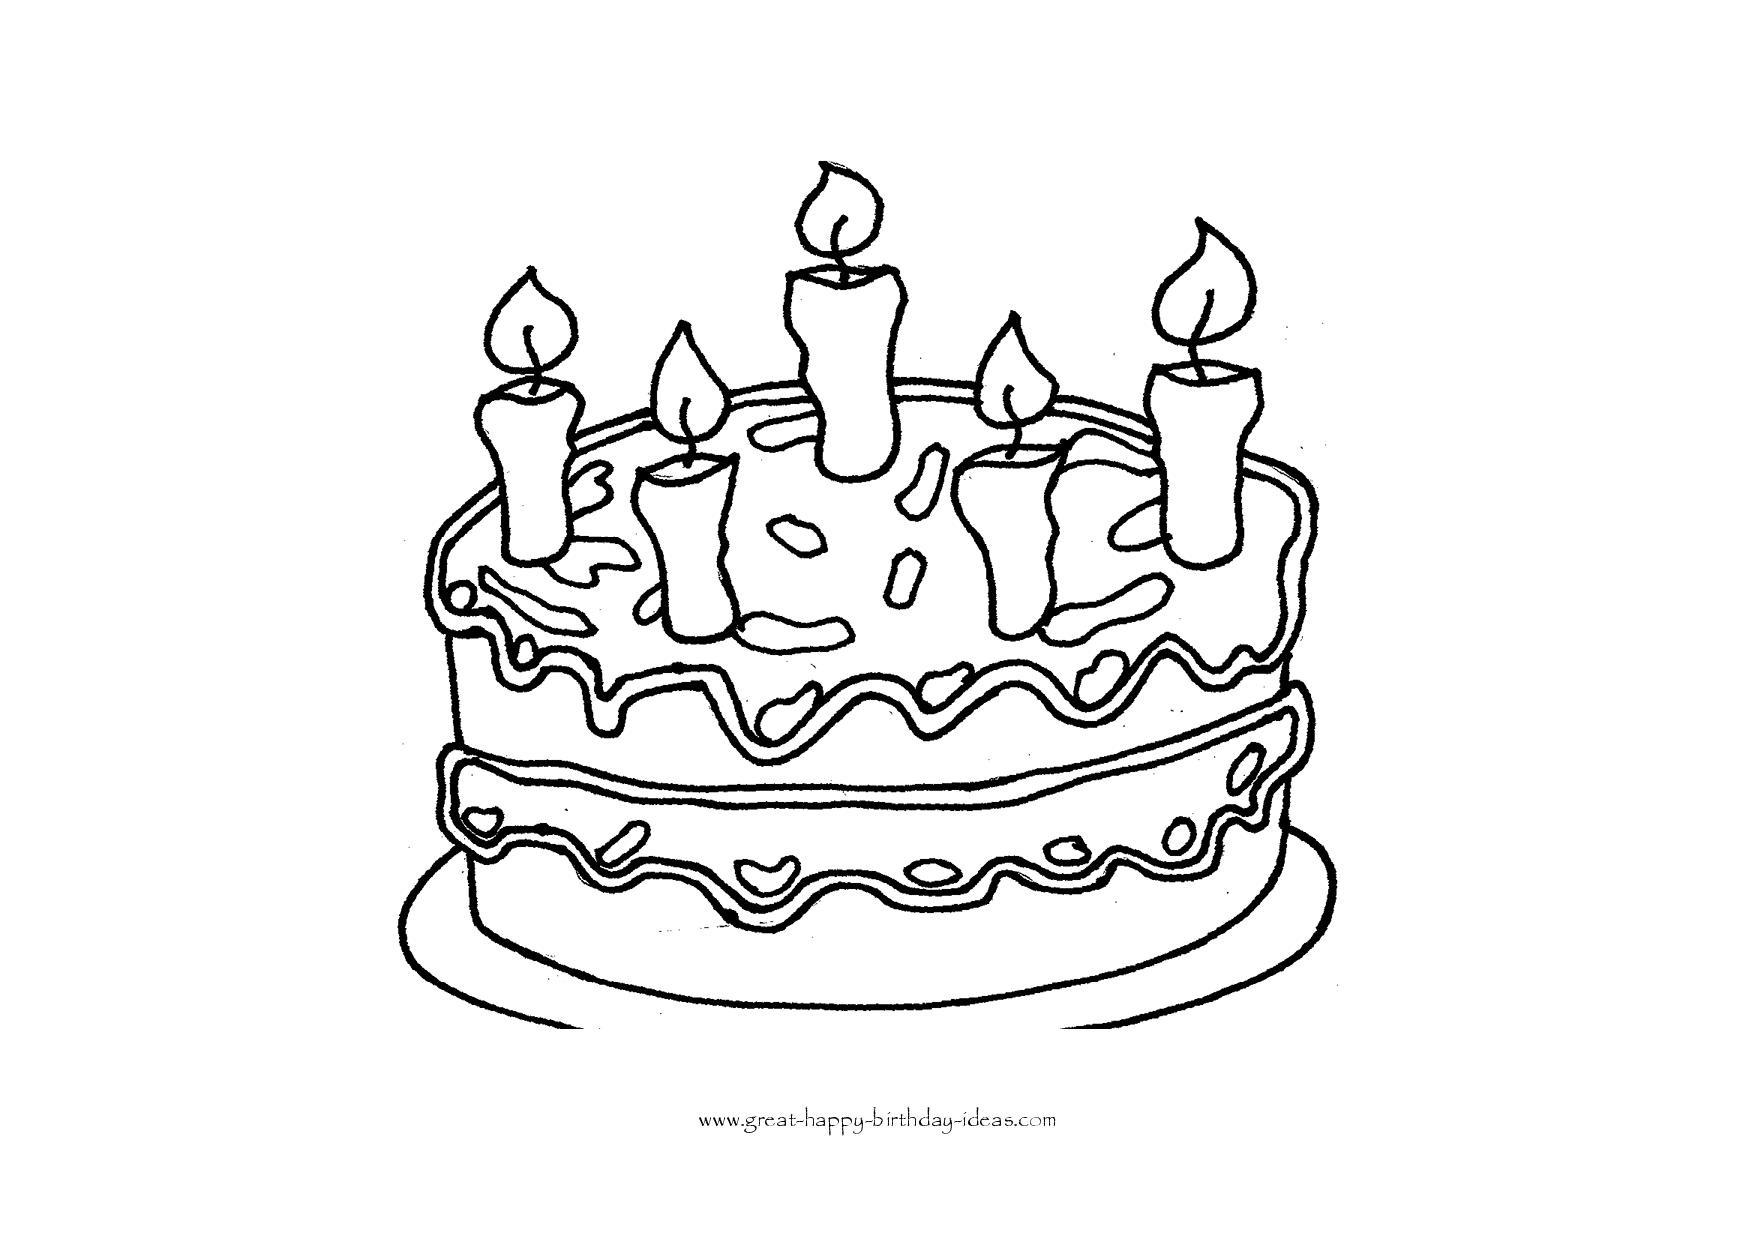 Printable Birthday Coloring Pages - Free Printable Birthday Cake